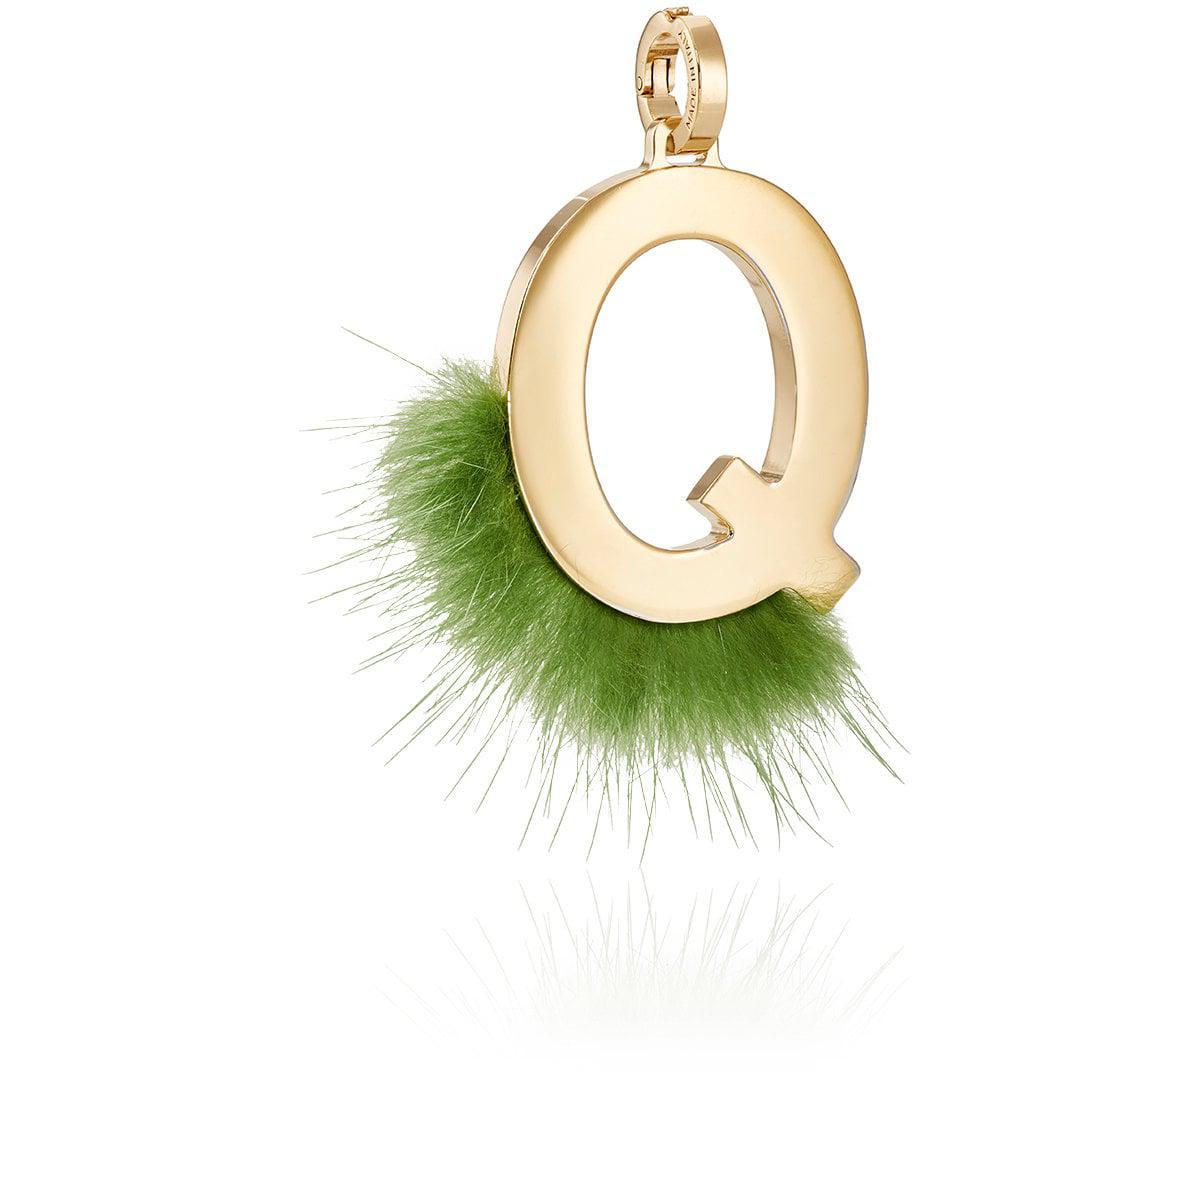 Fendi ABClick Q pendant charm - Green oOld2r5kK